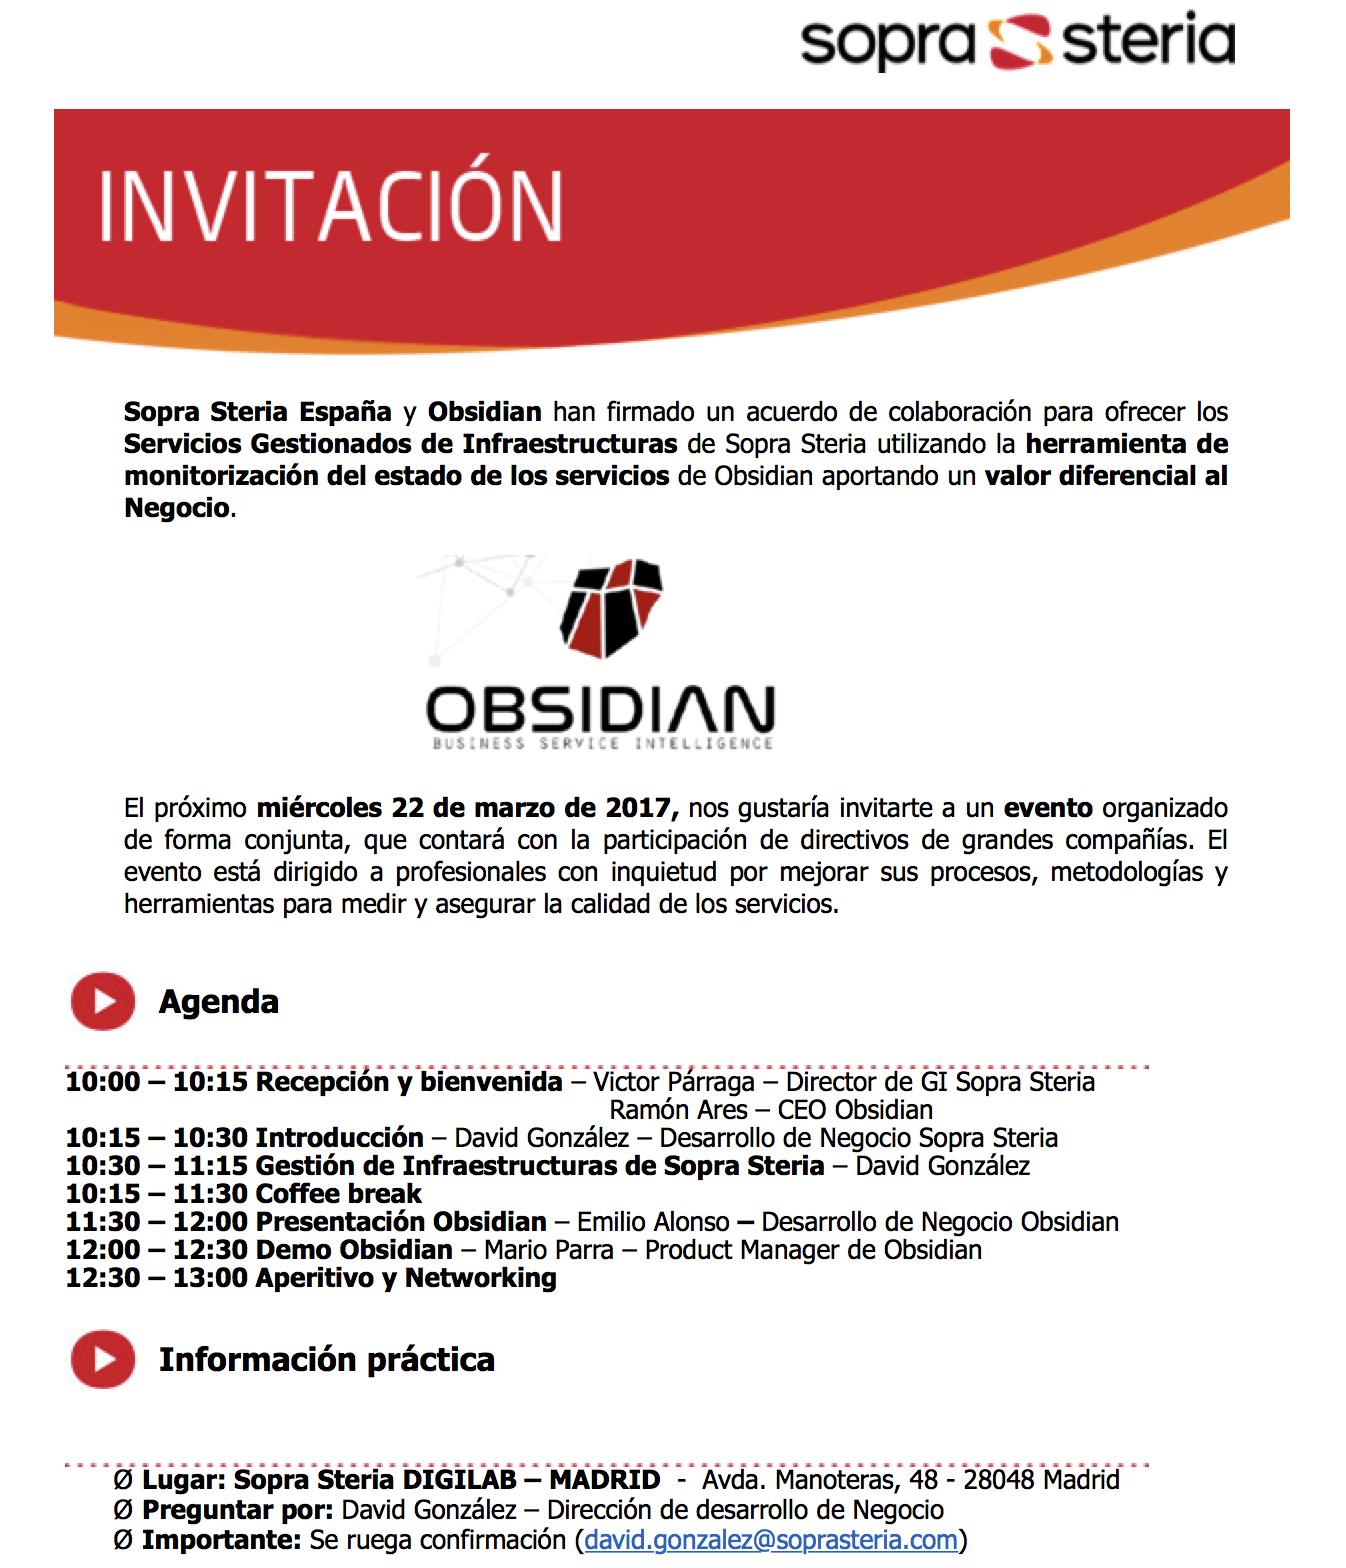 Evento com la Obsidian organizado por Sopra Steria en Madrid